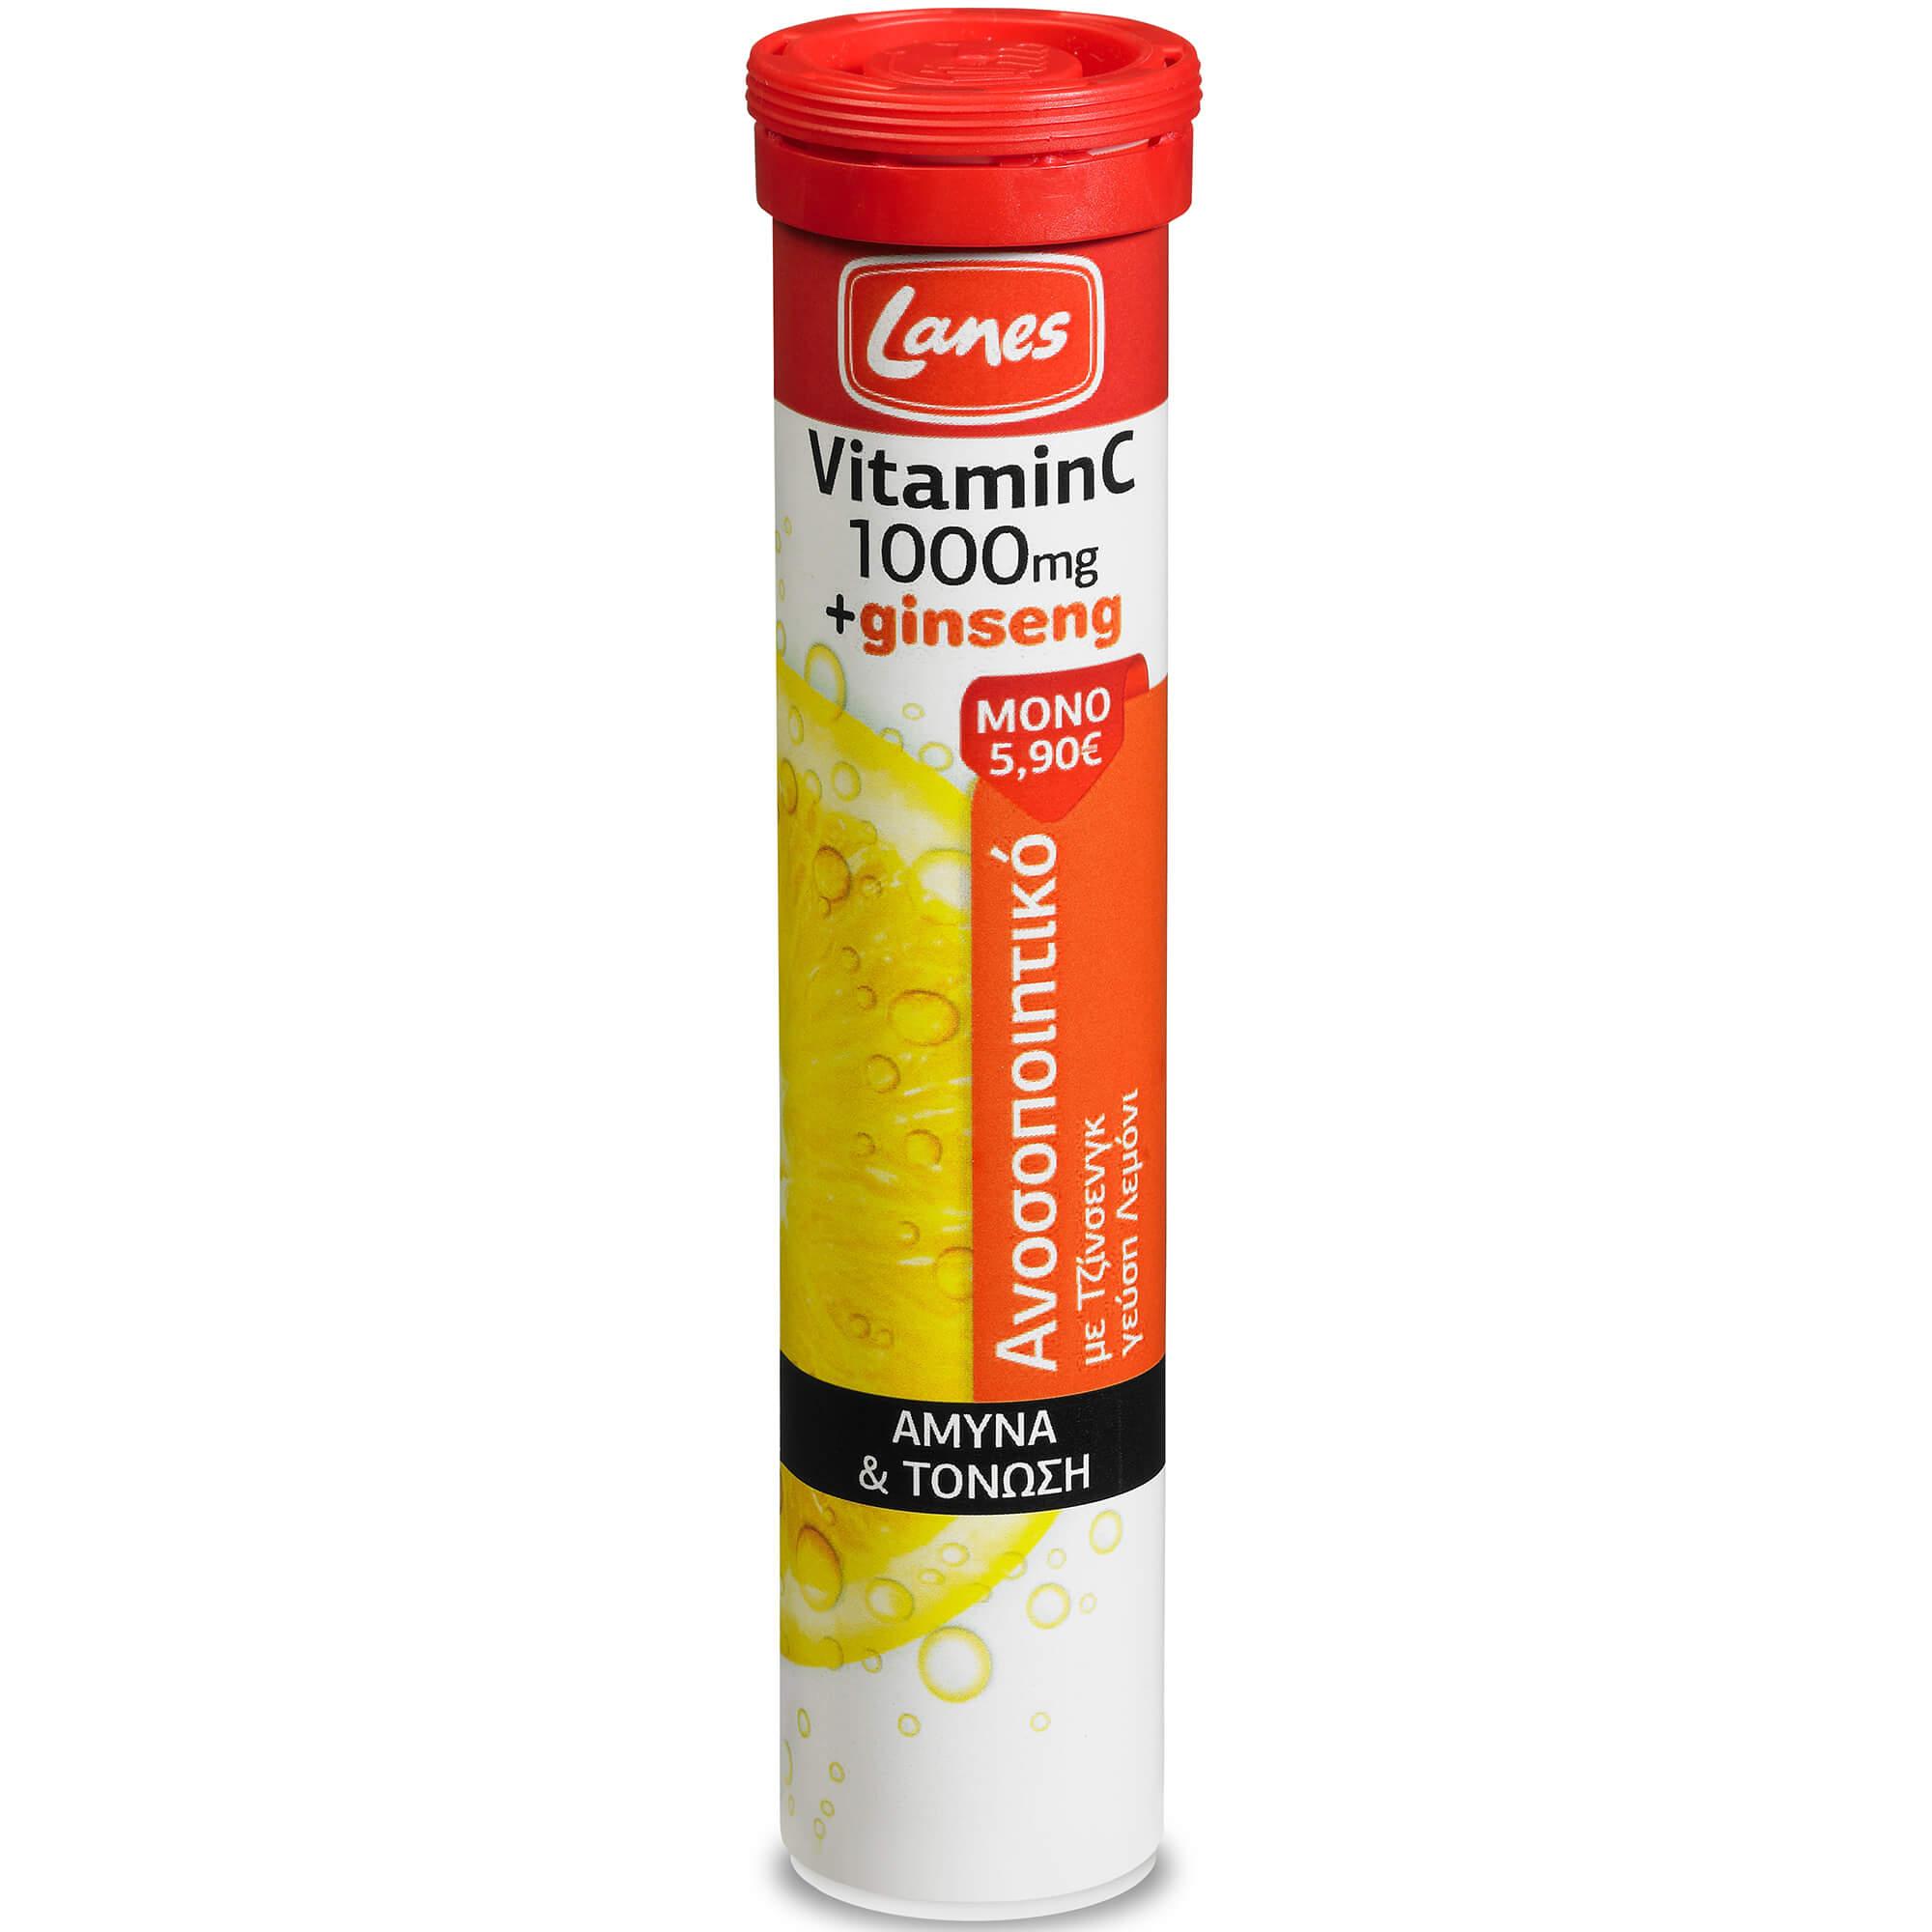 Lanes Vitamin C 1000mg & Ginseng, Αναβράζουσα Βιταμίνη C Για Την Τόνωση Του Ανοσοποιητικού 20 Αναβρ. Δισκία